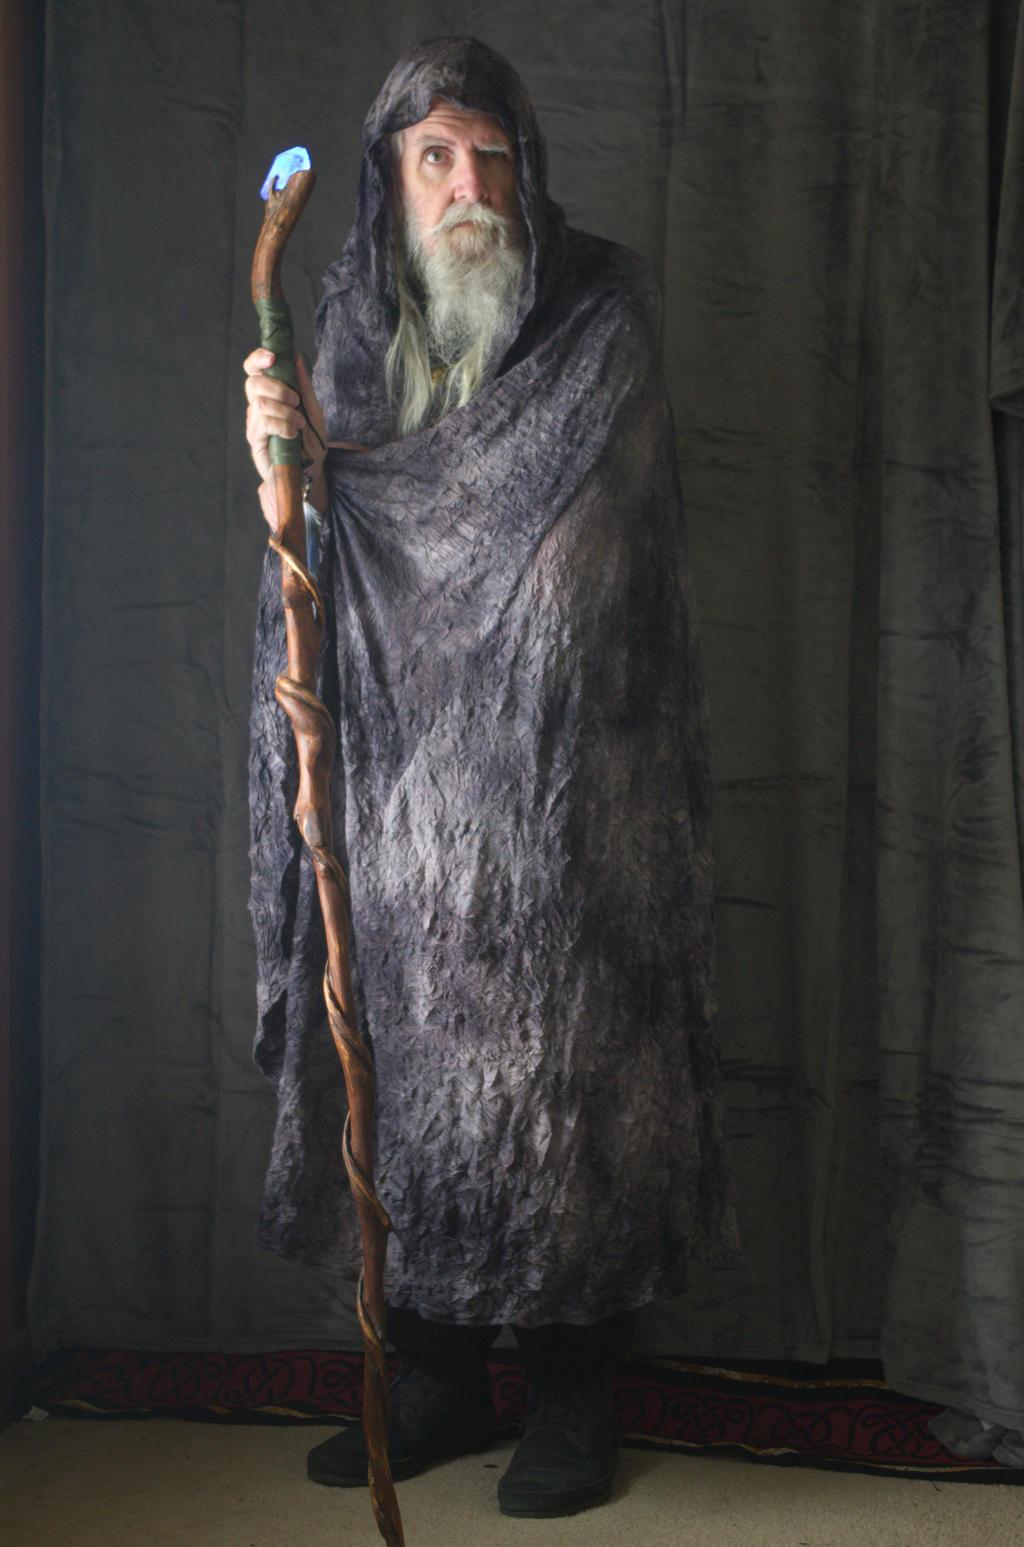 2017-03-31 Ancient Druid 22